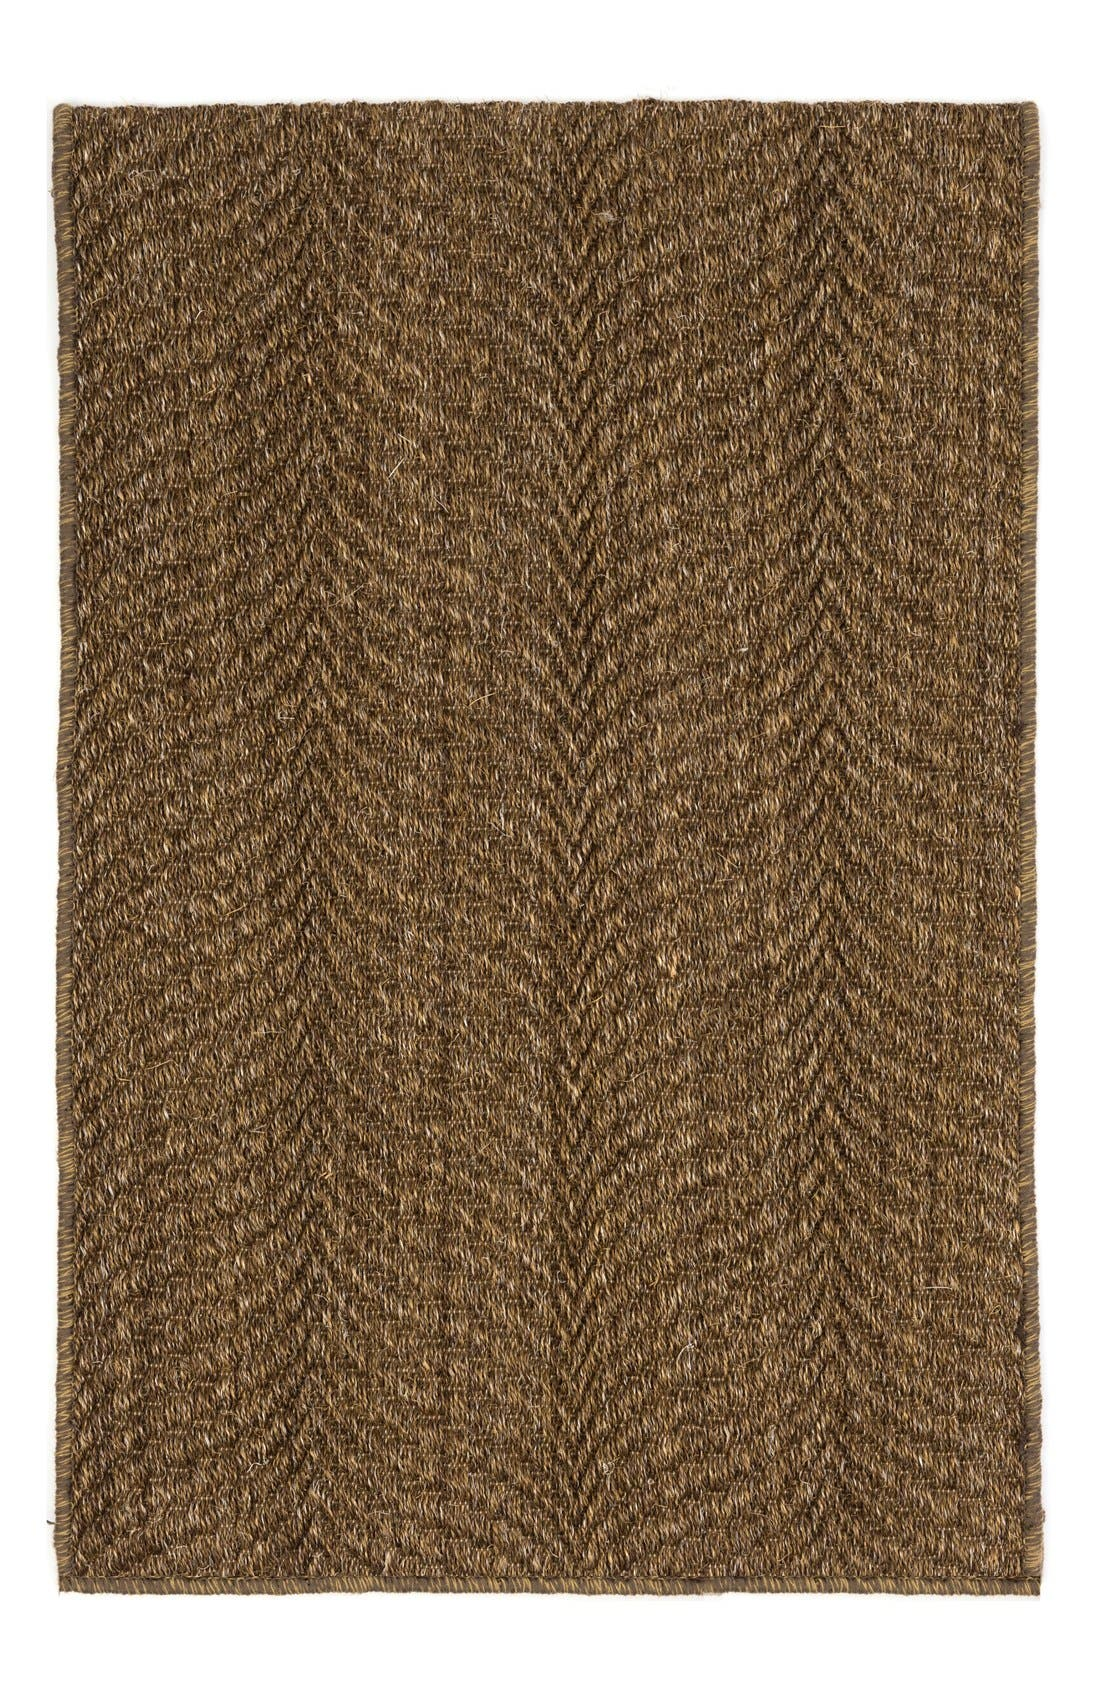 'Wave' Rug,                         Main,                         color, 200